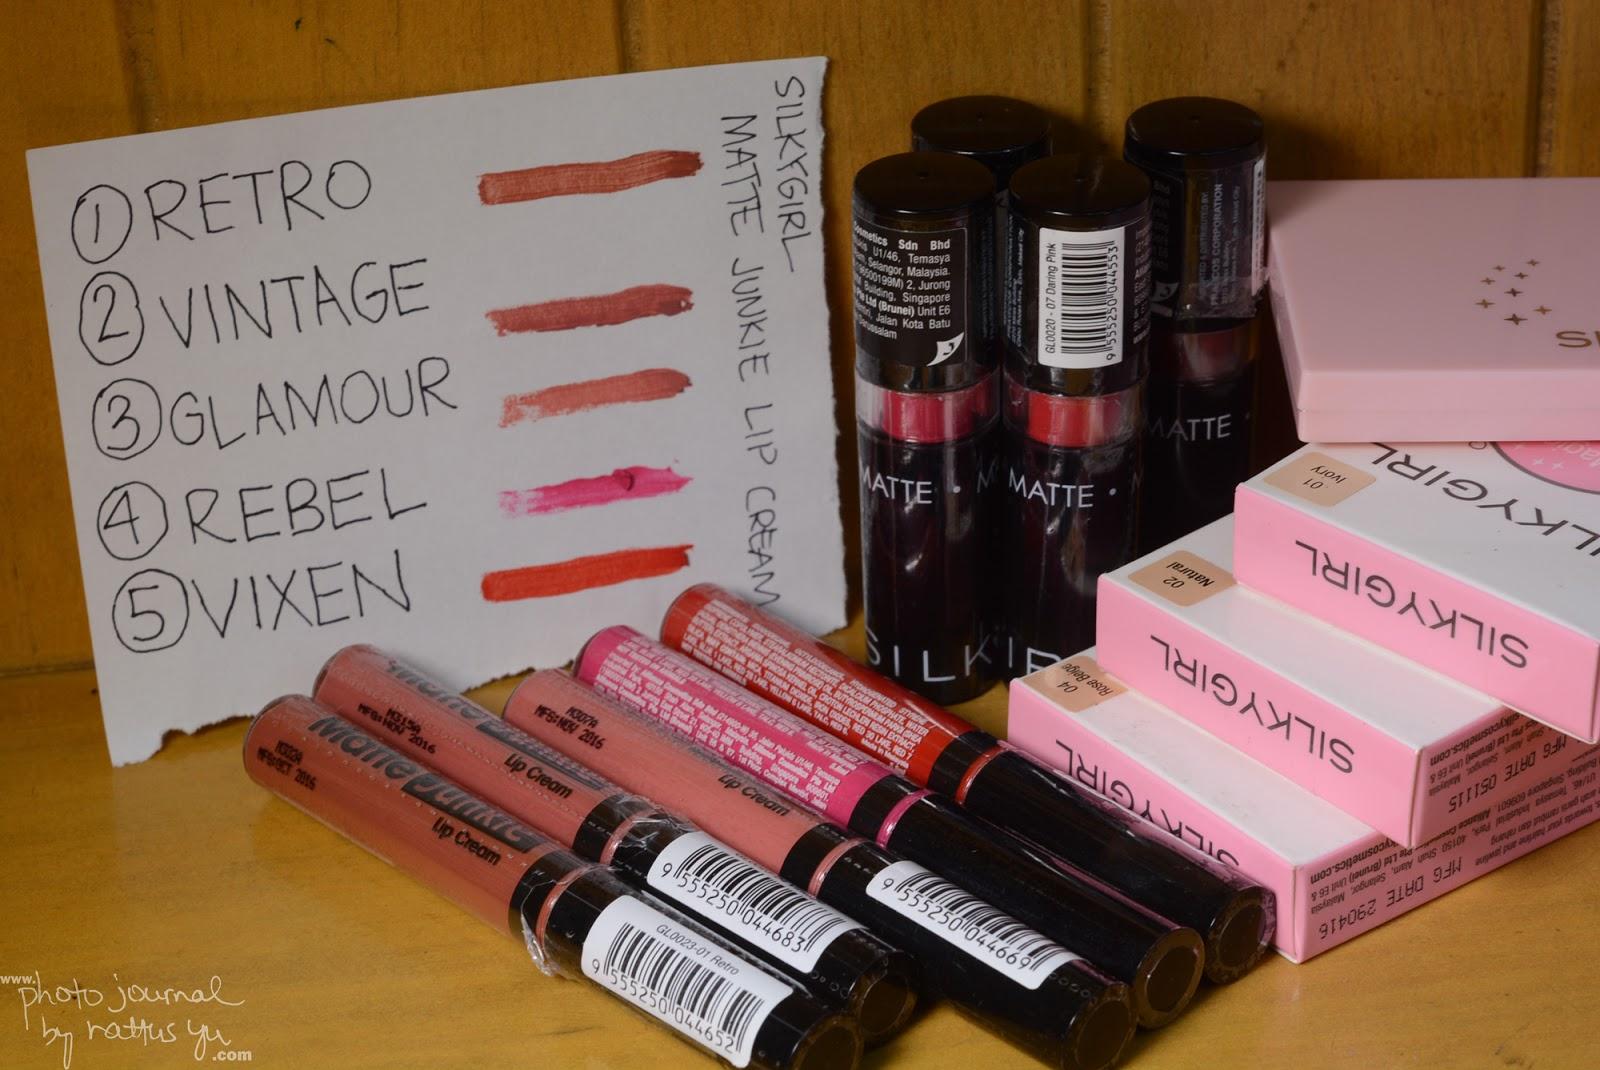 Silkygirl Cosmetics -- Magic BB Powder, Matte Junkie Lip Cream, and Go Matte Lipstick